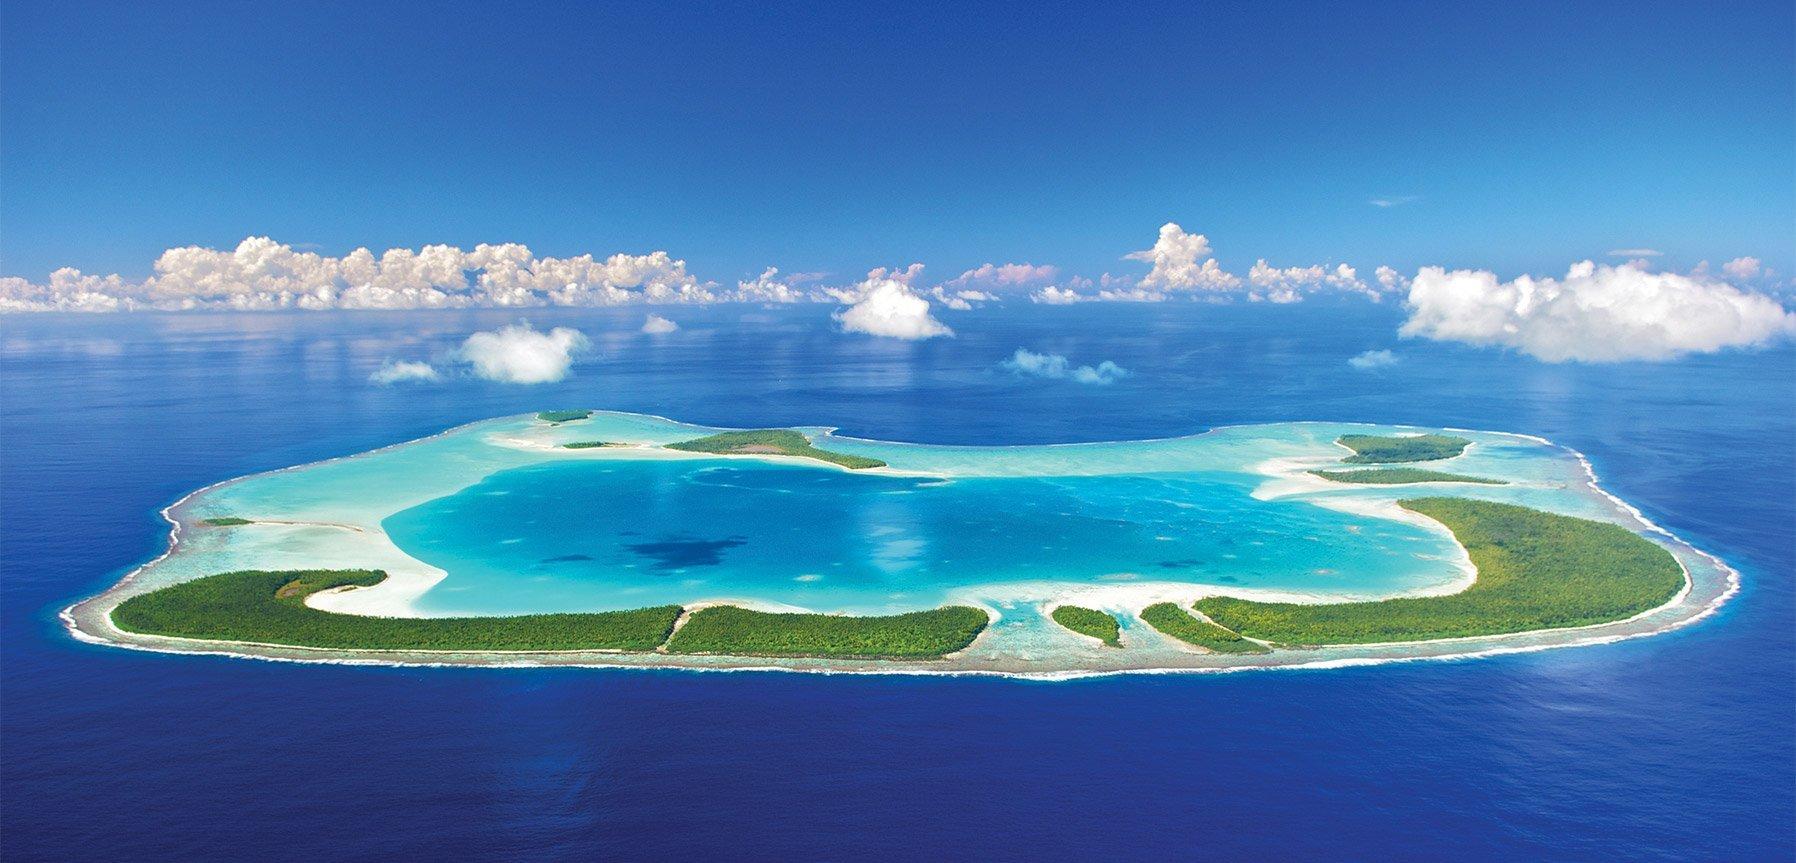 A drone view of The Brando island